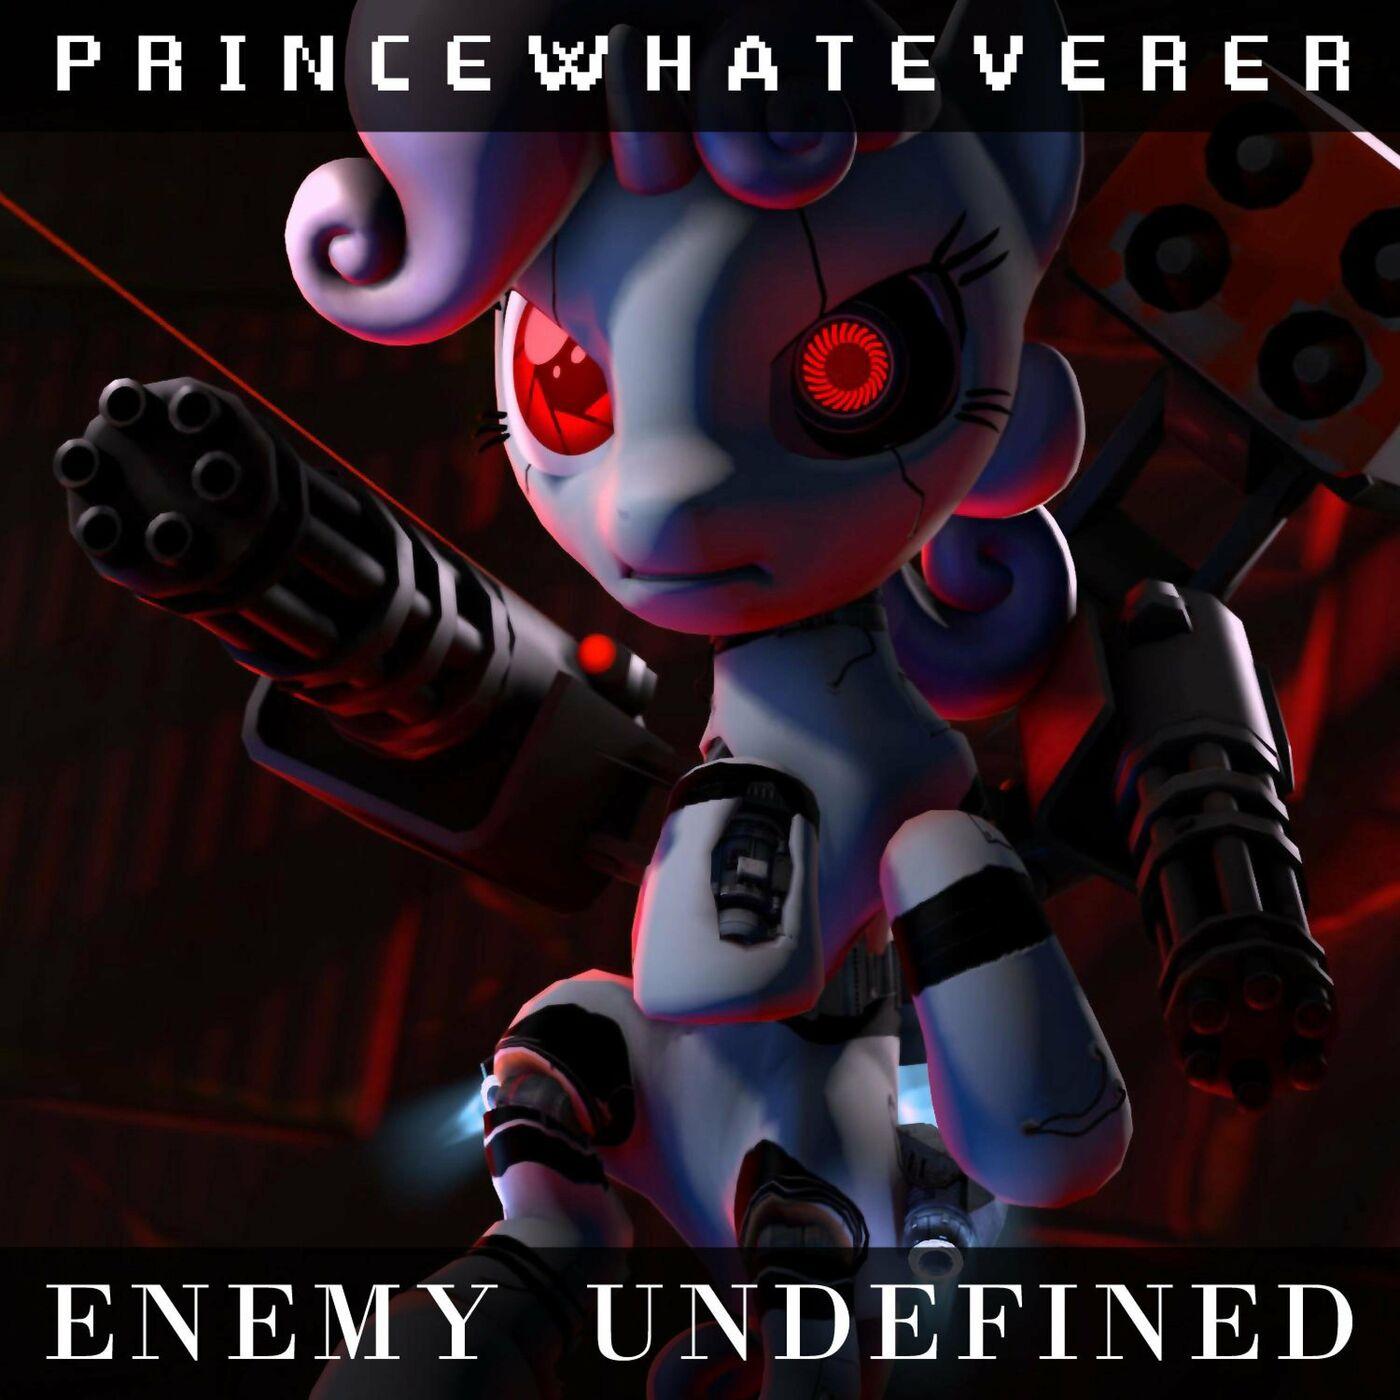 PrinceWhateverer - Enemy Undefined [single] (2020)